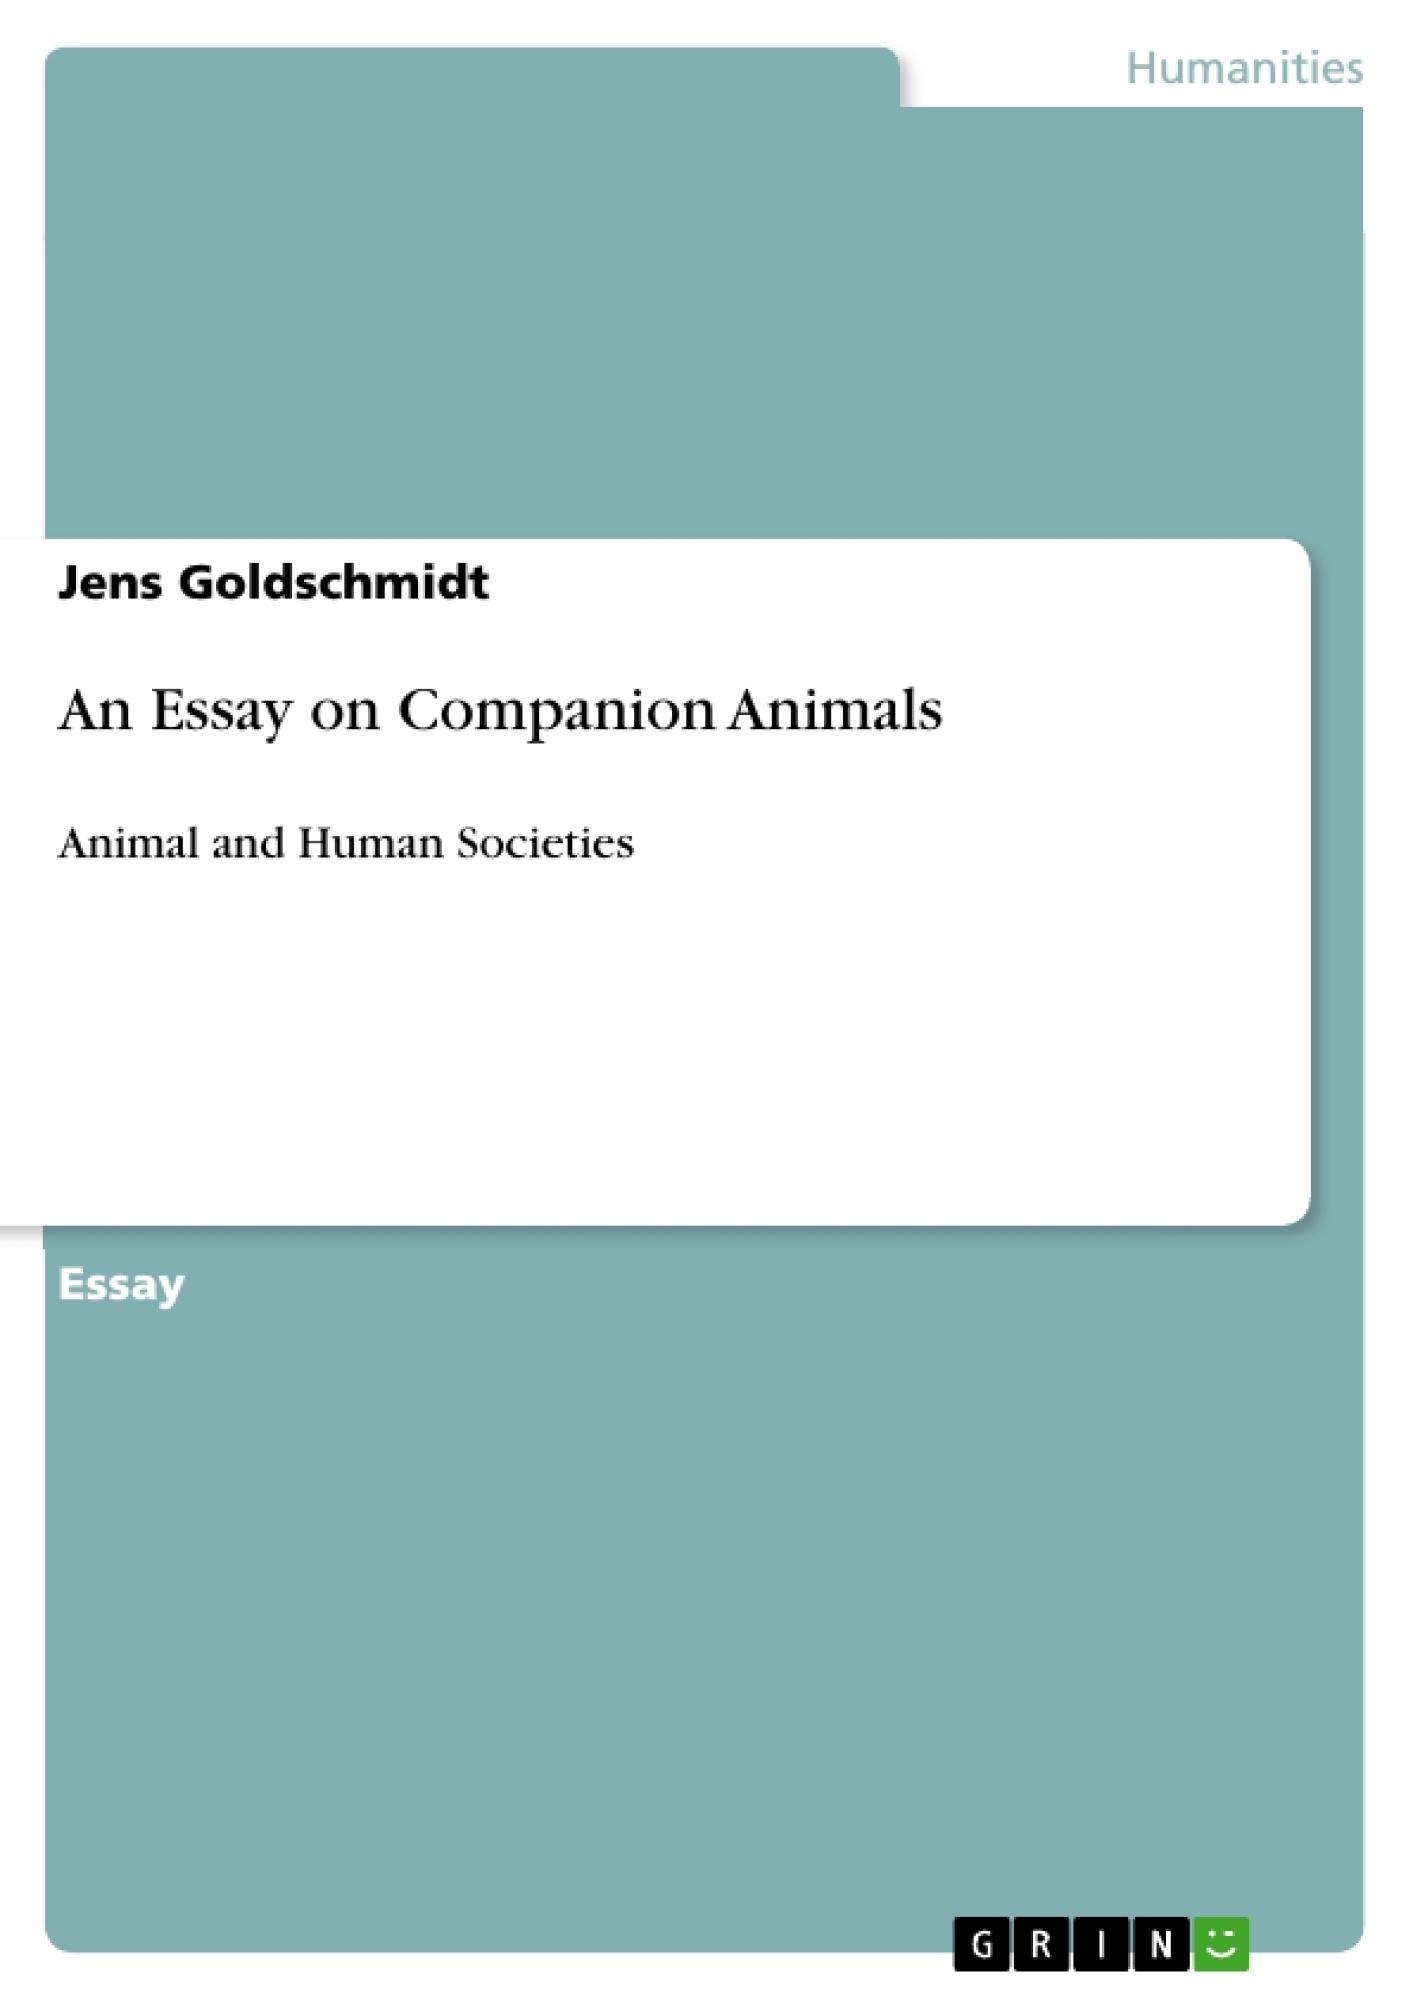 Title: An Essay on Companion Animals